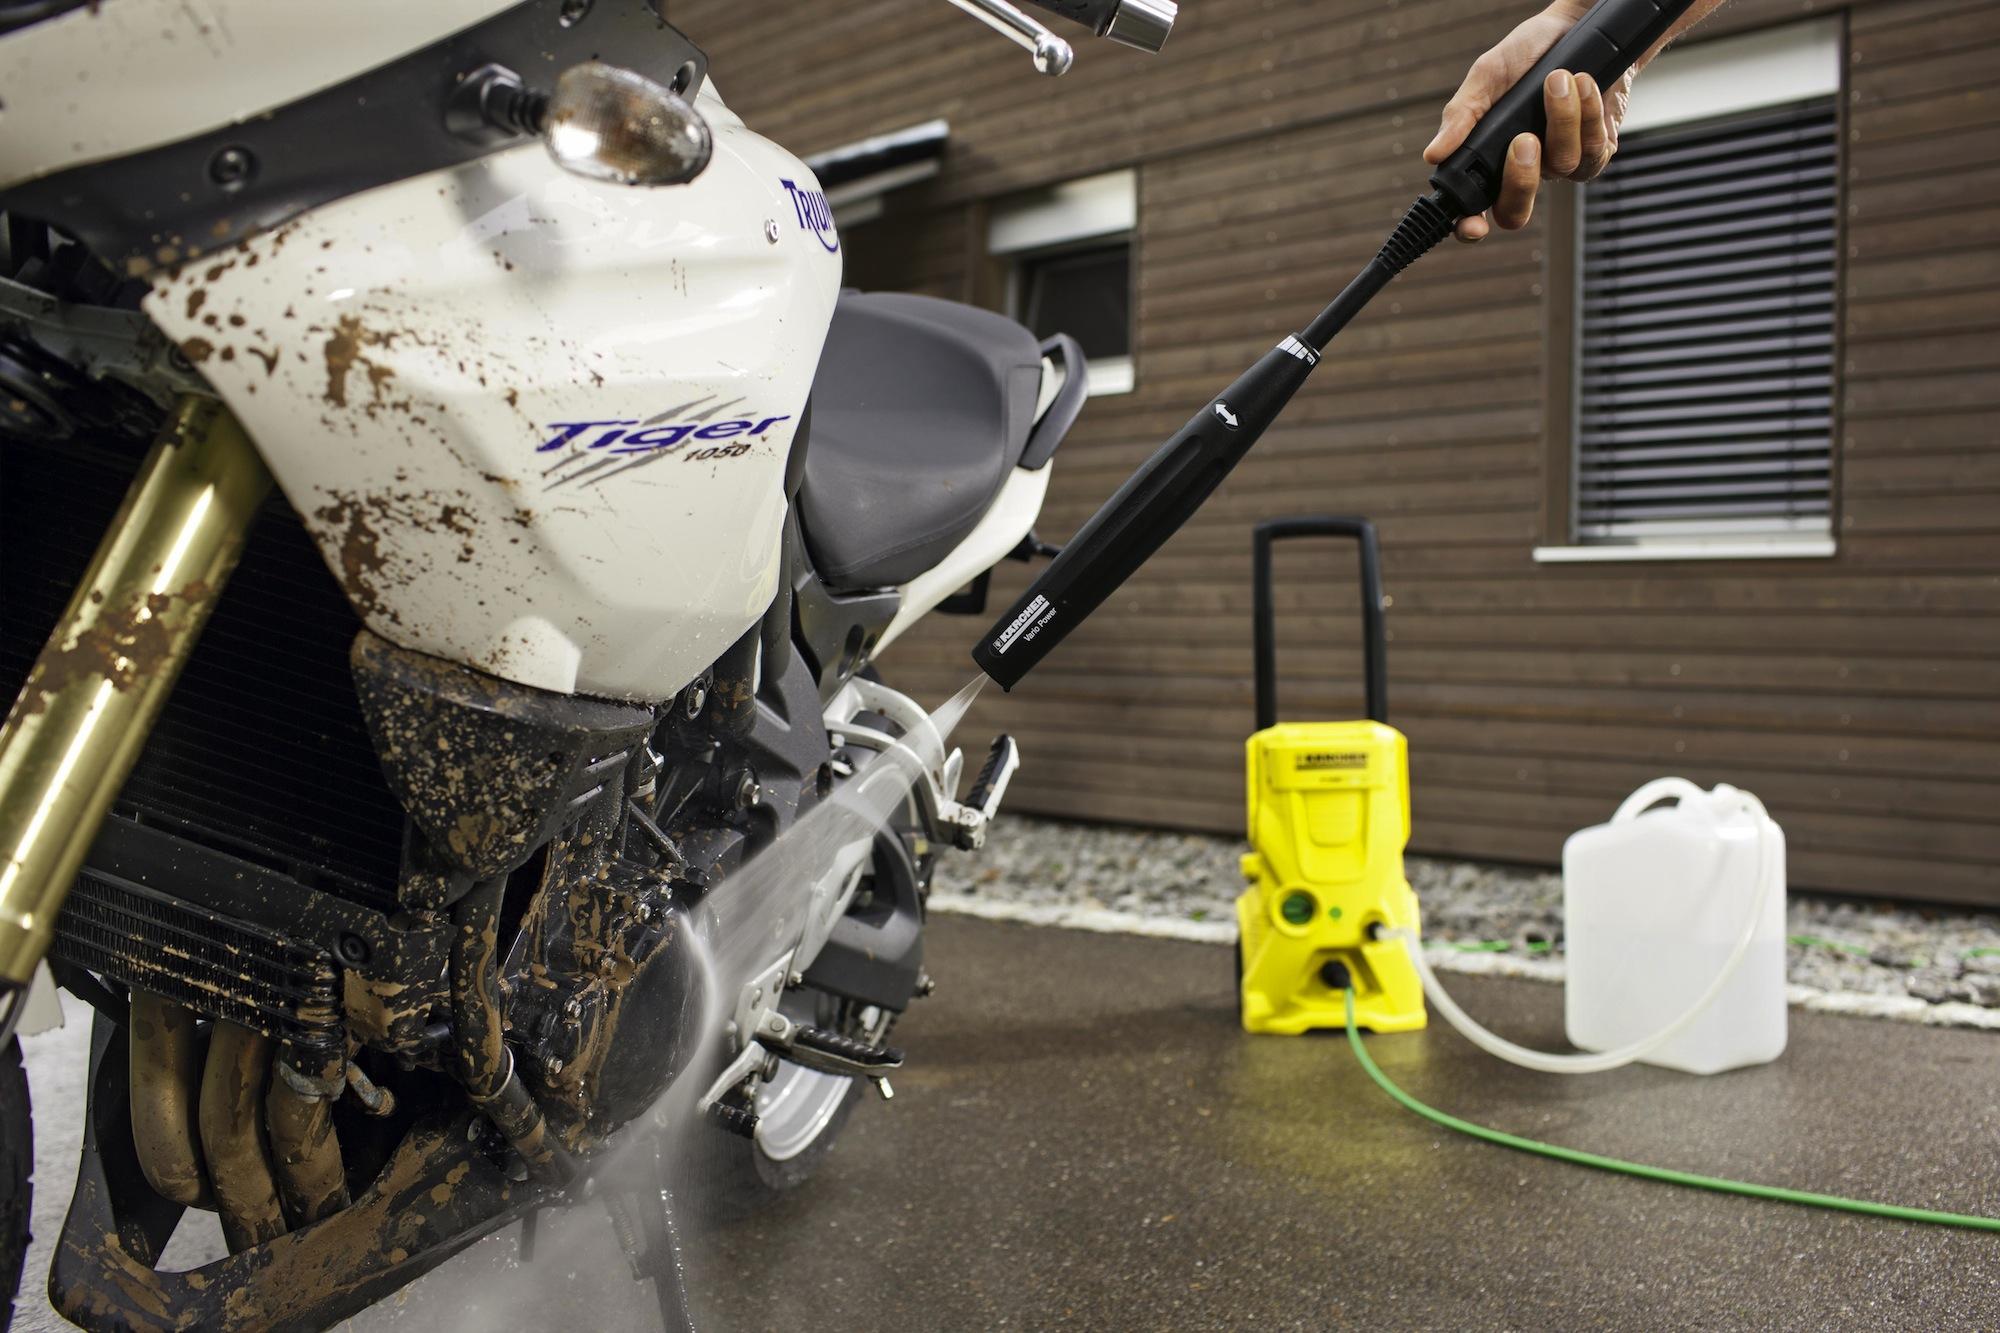 Top 10 tips for washing your motorcycle - Motorbike Writer